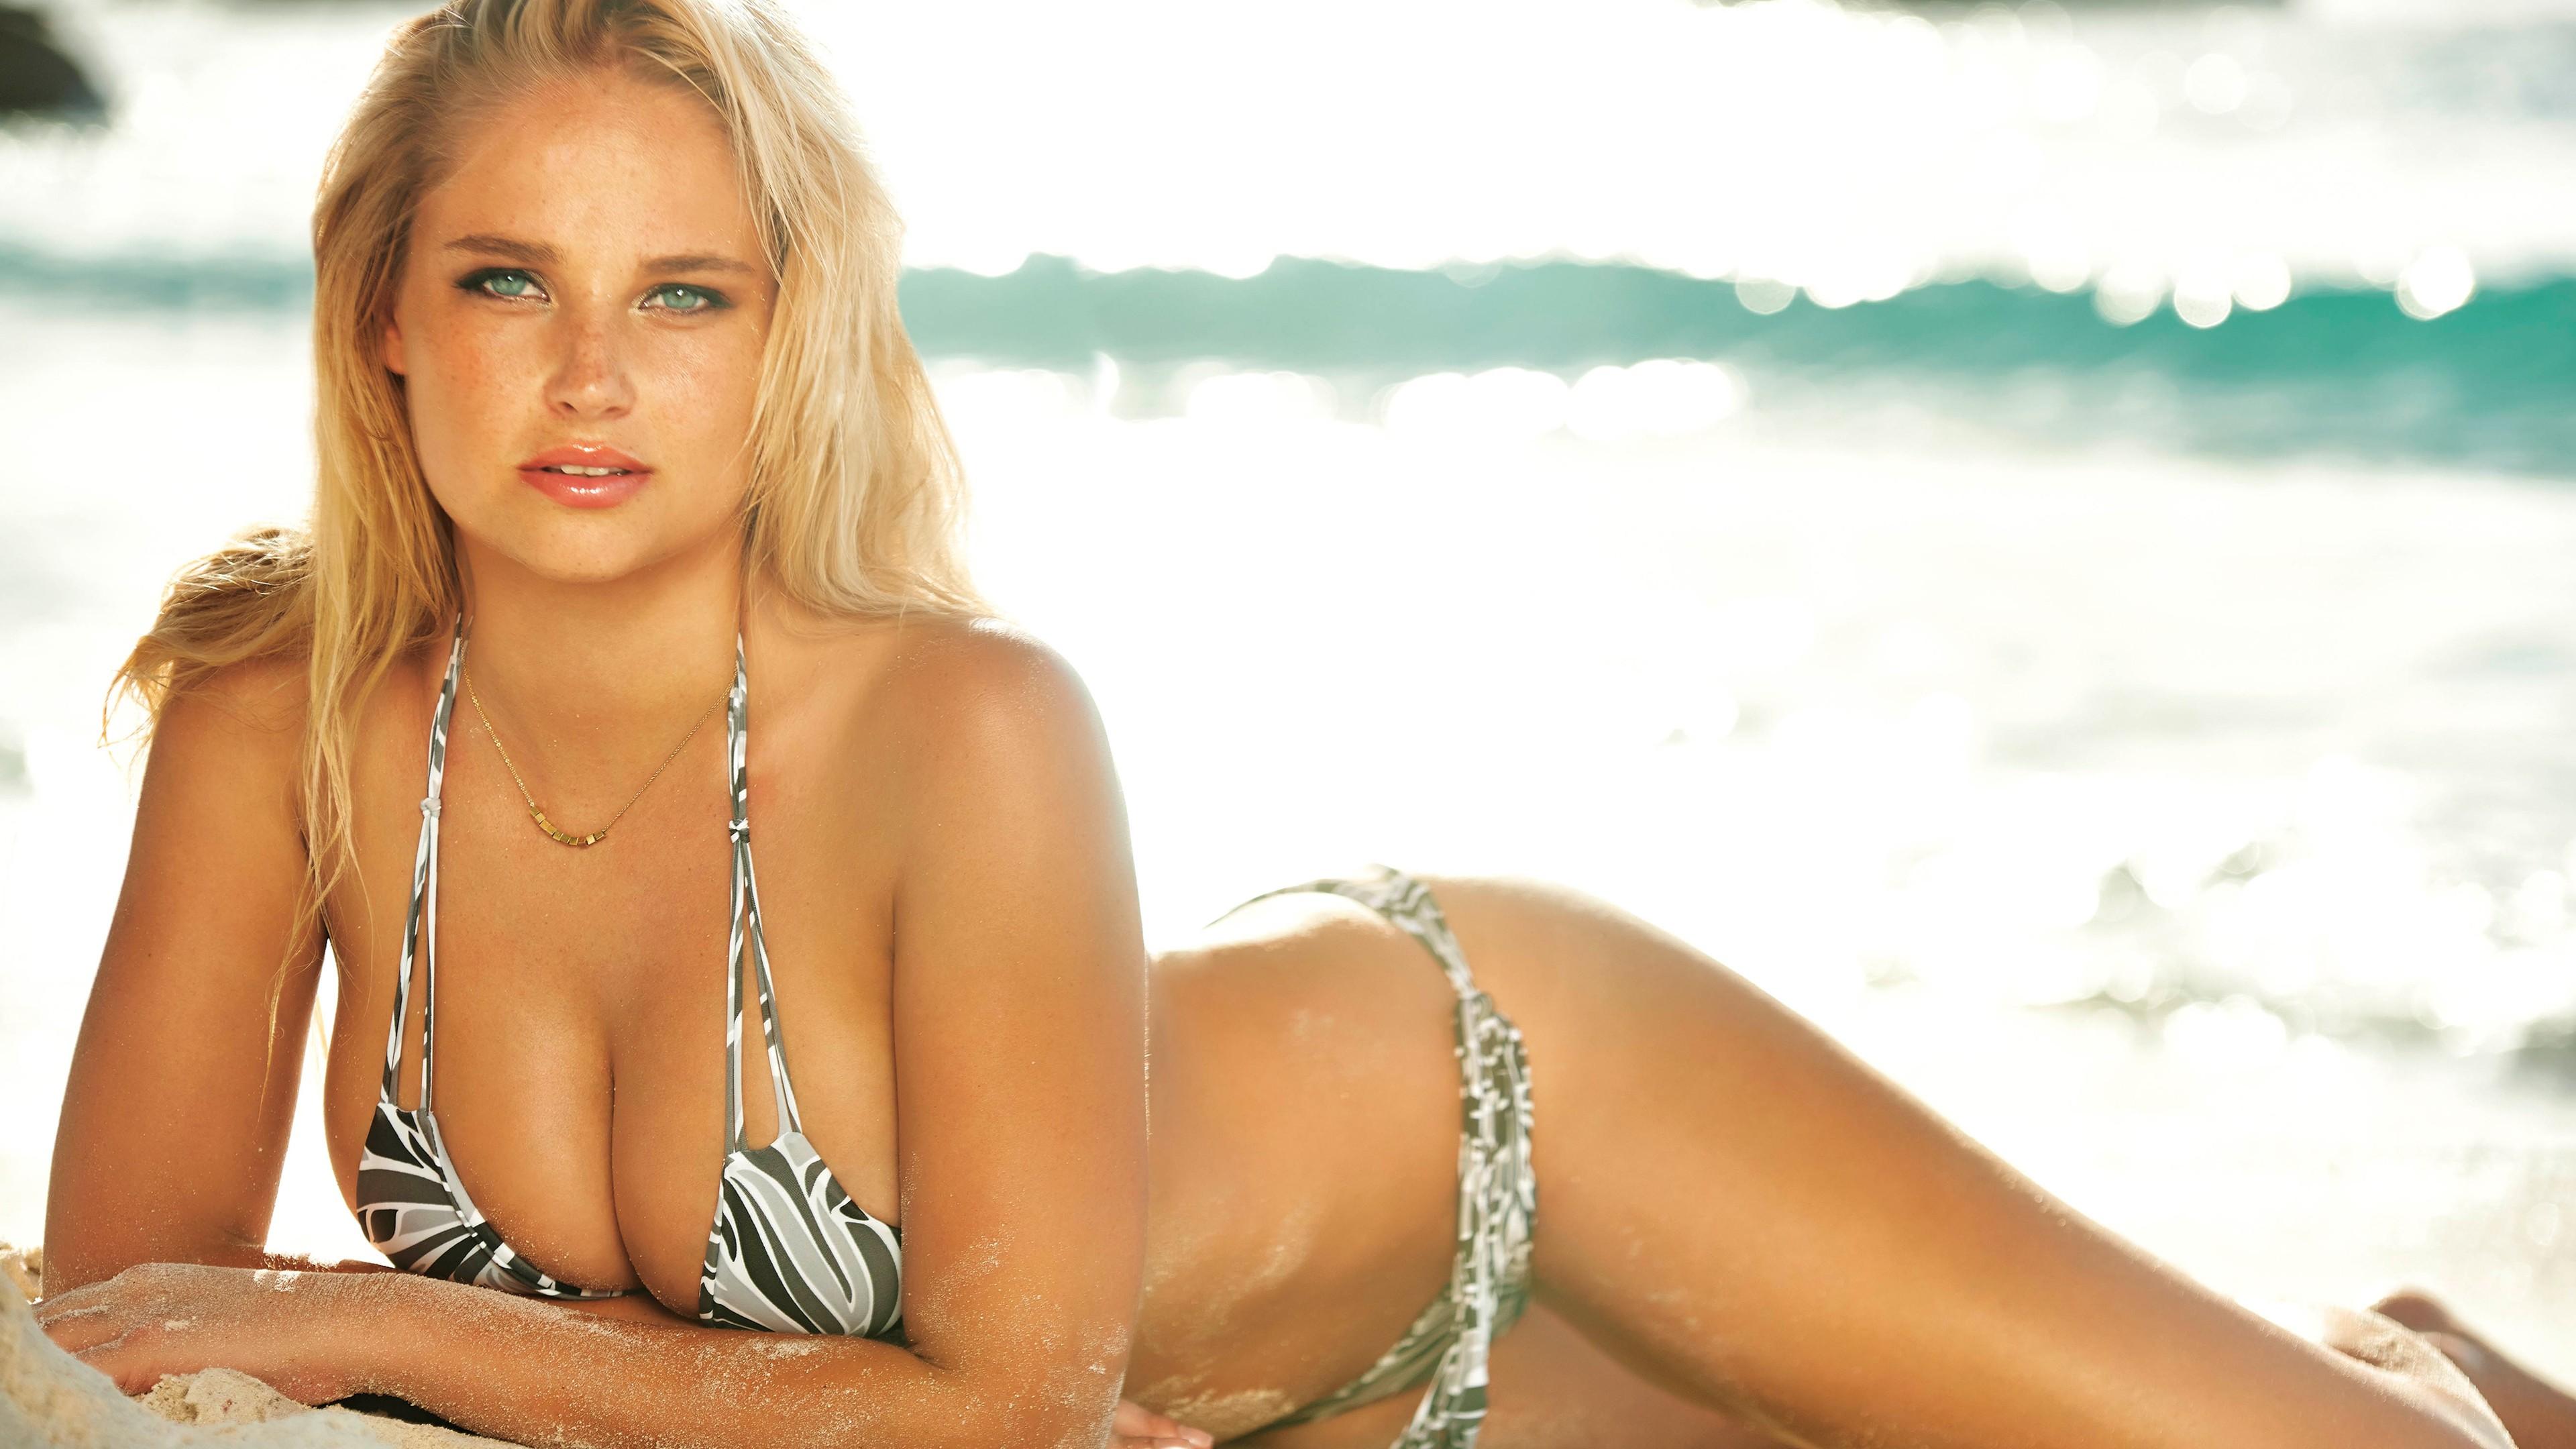 People 3840x2160 Genevieve Morton South Africa bikini blonde big boobs natural boobs beach women